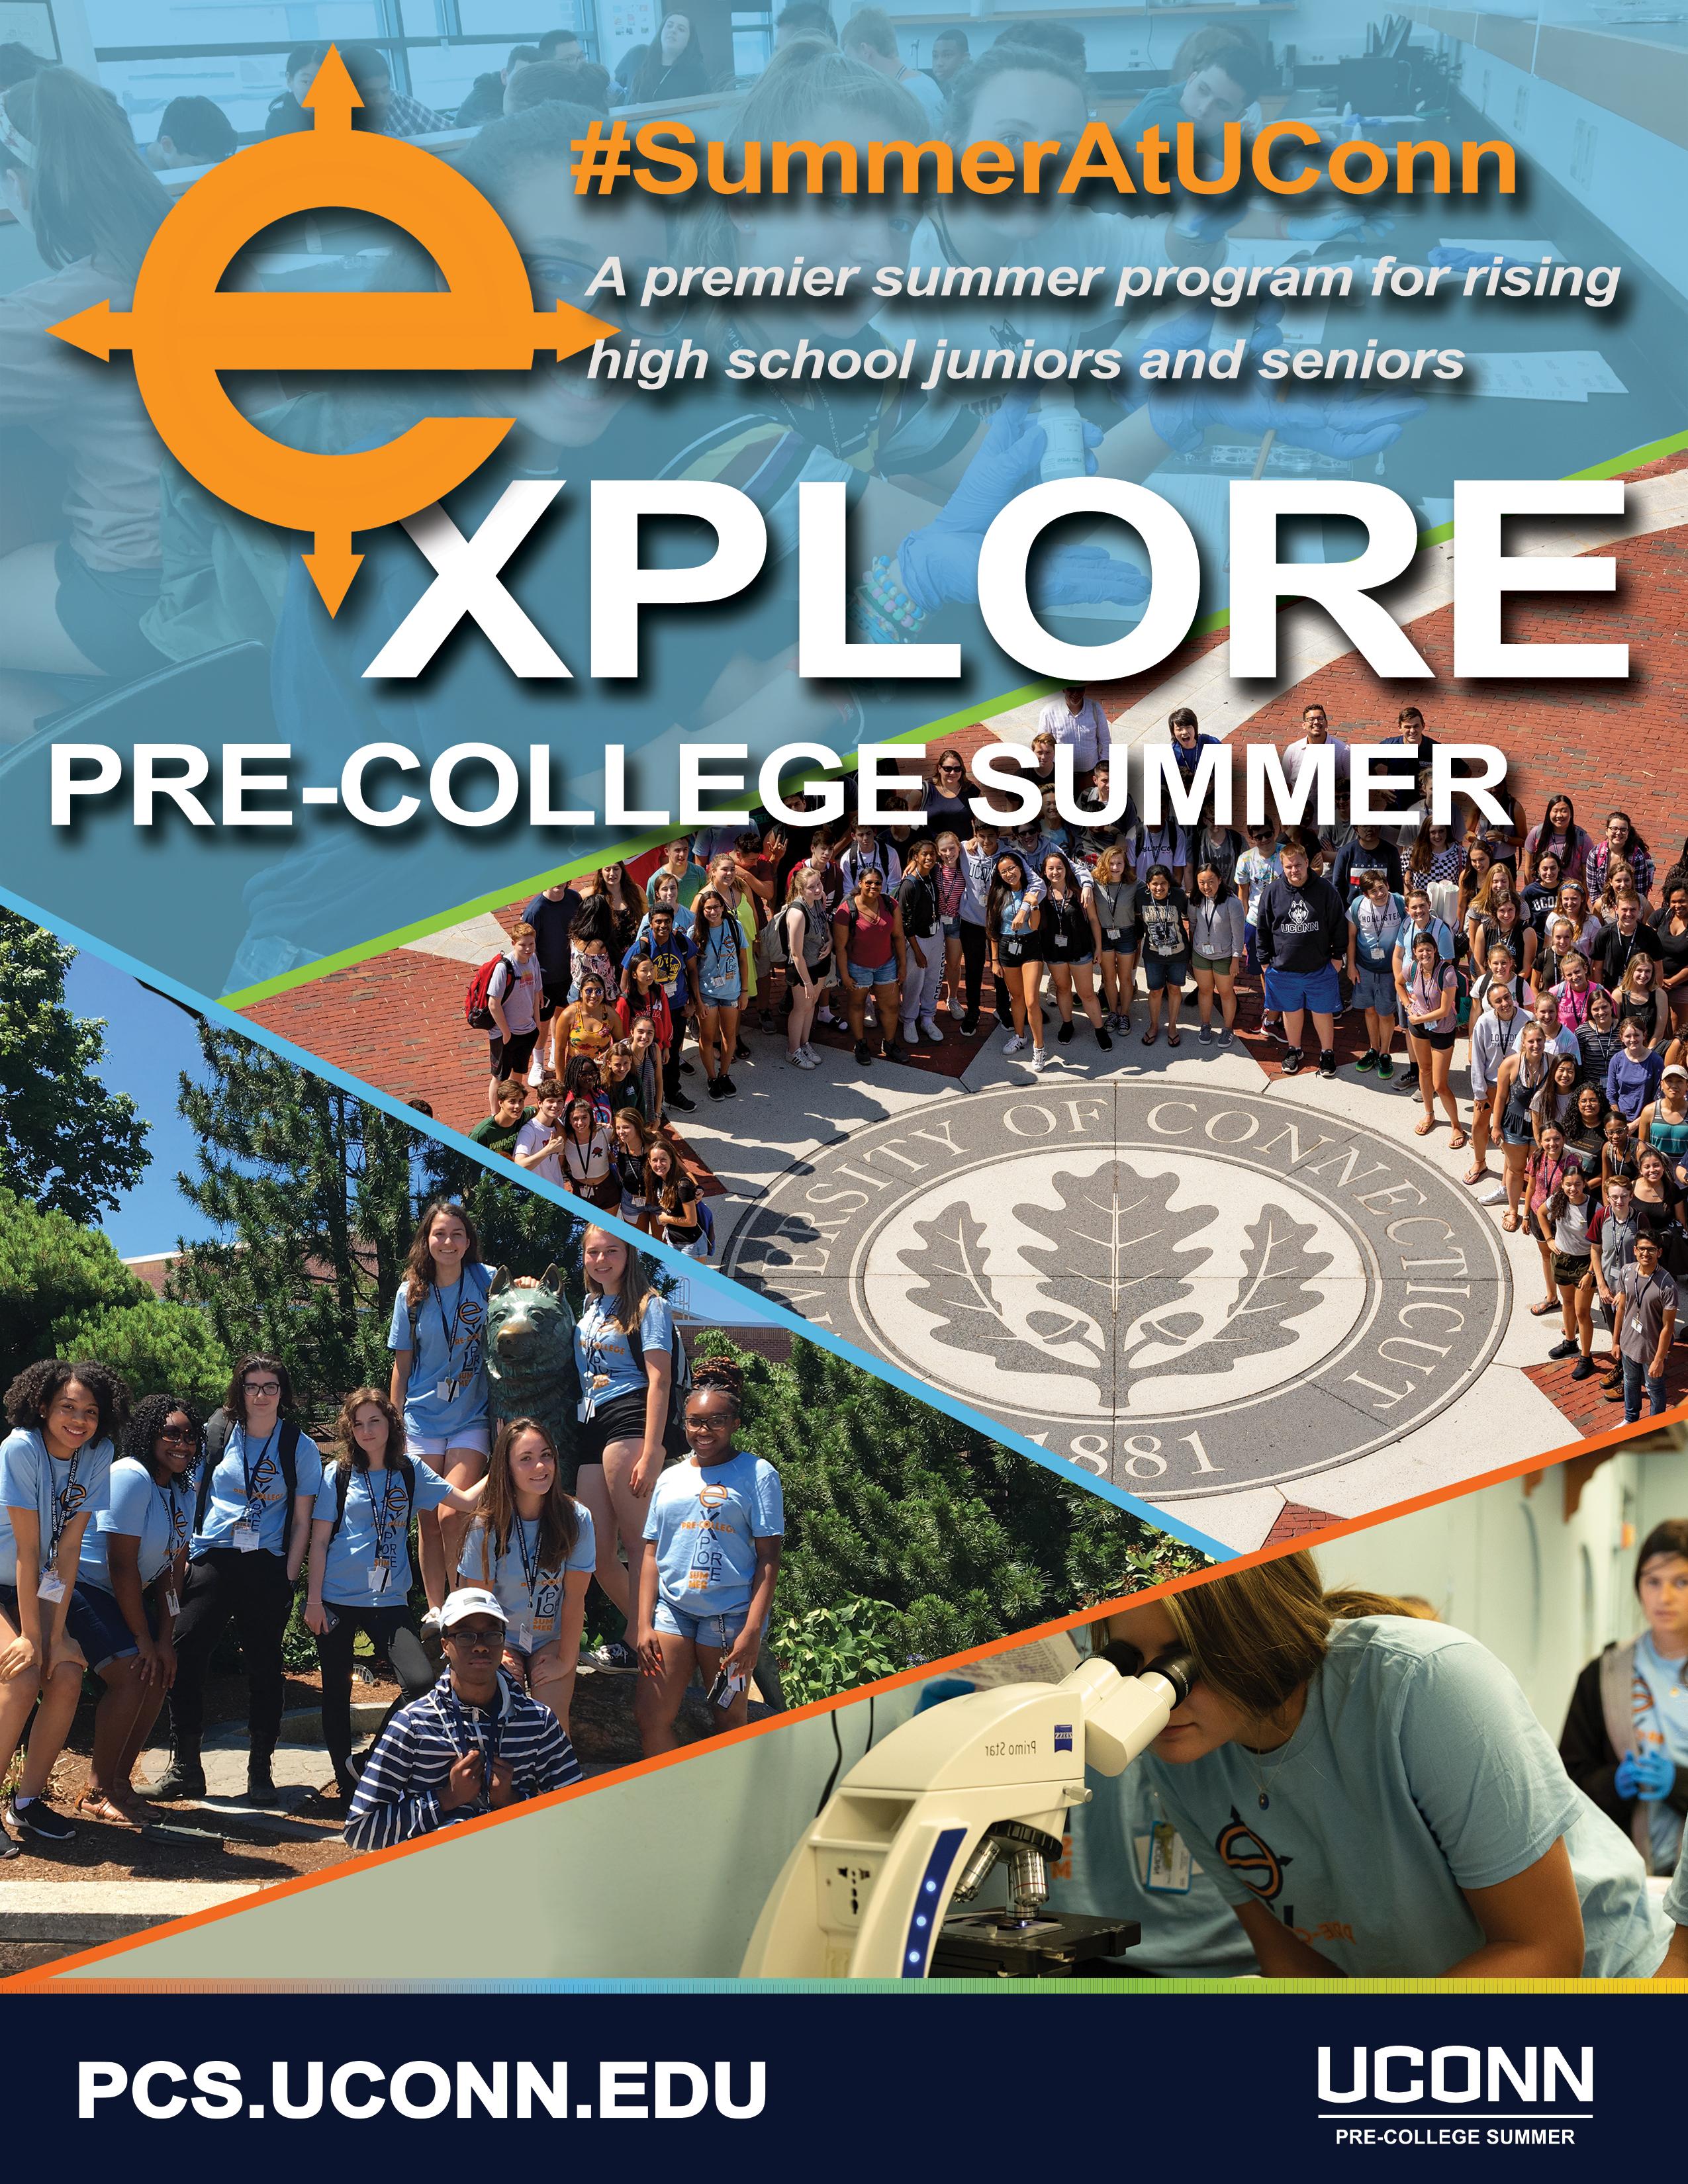 UConn Pre-College Summer: Pre-Psych: Psychology & Neuroscience